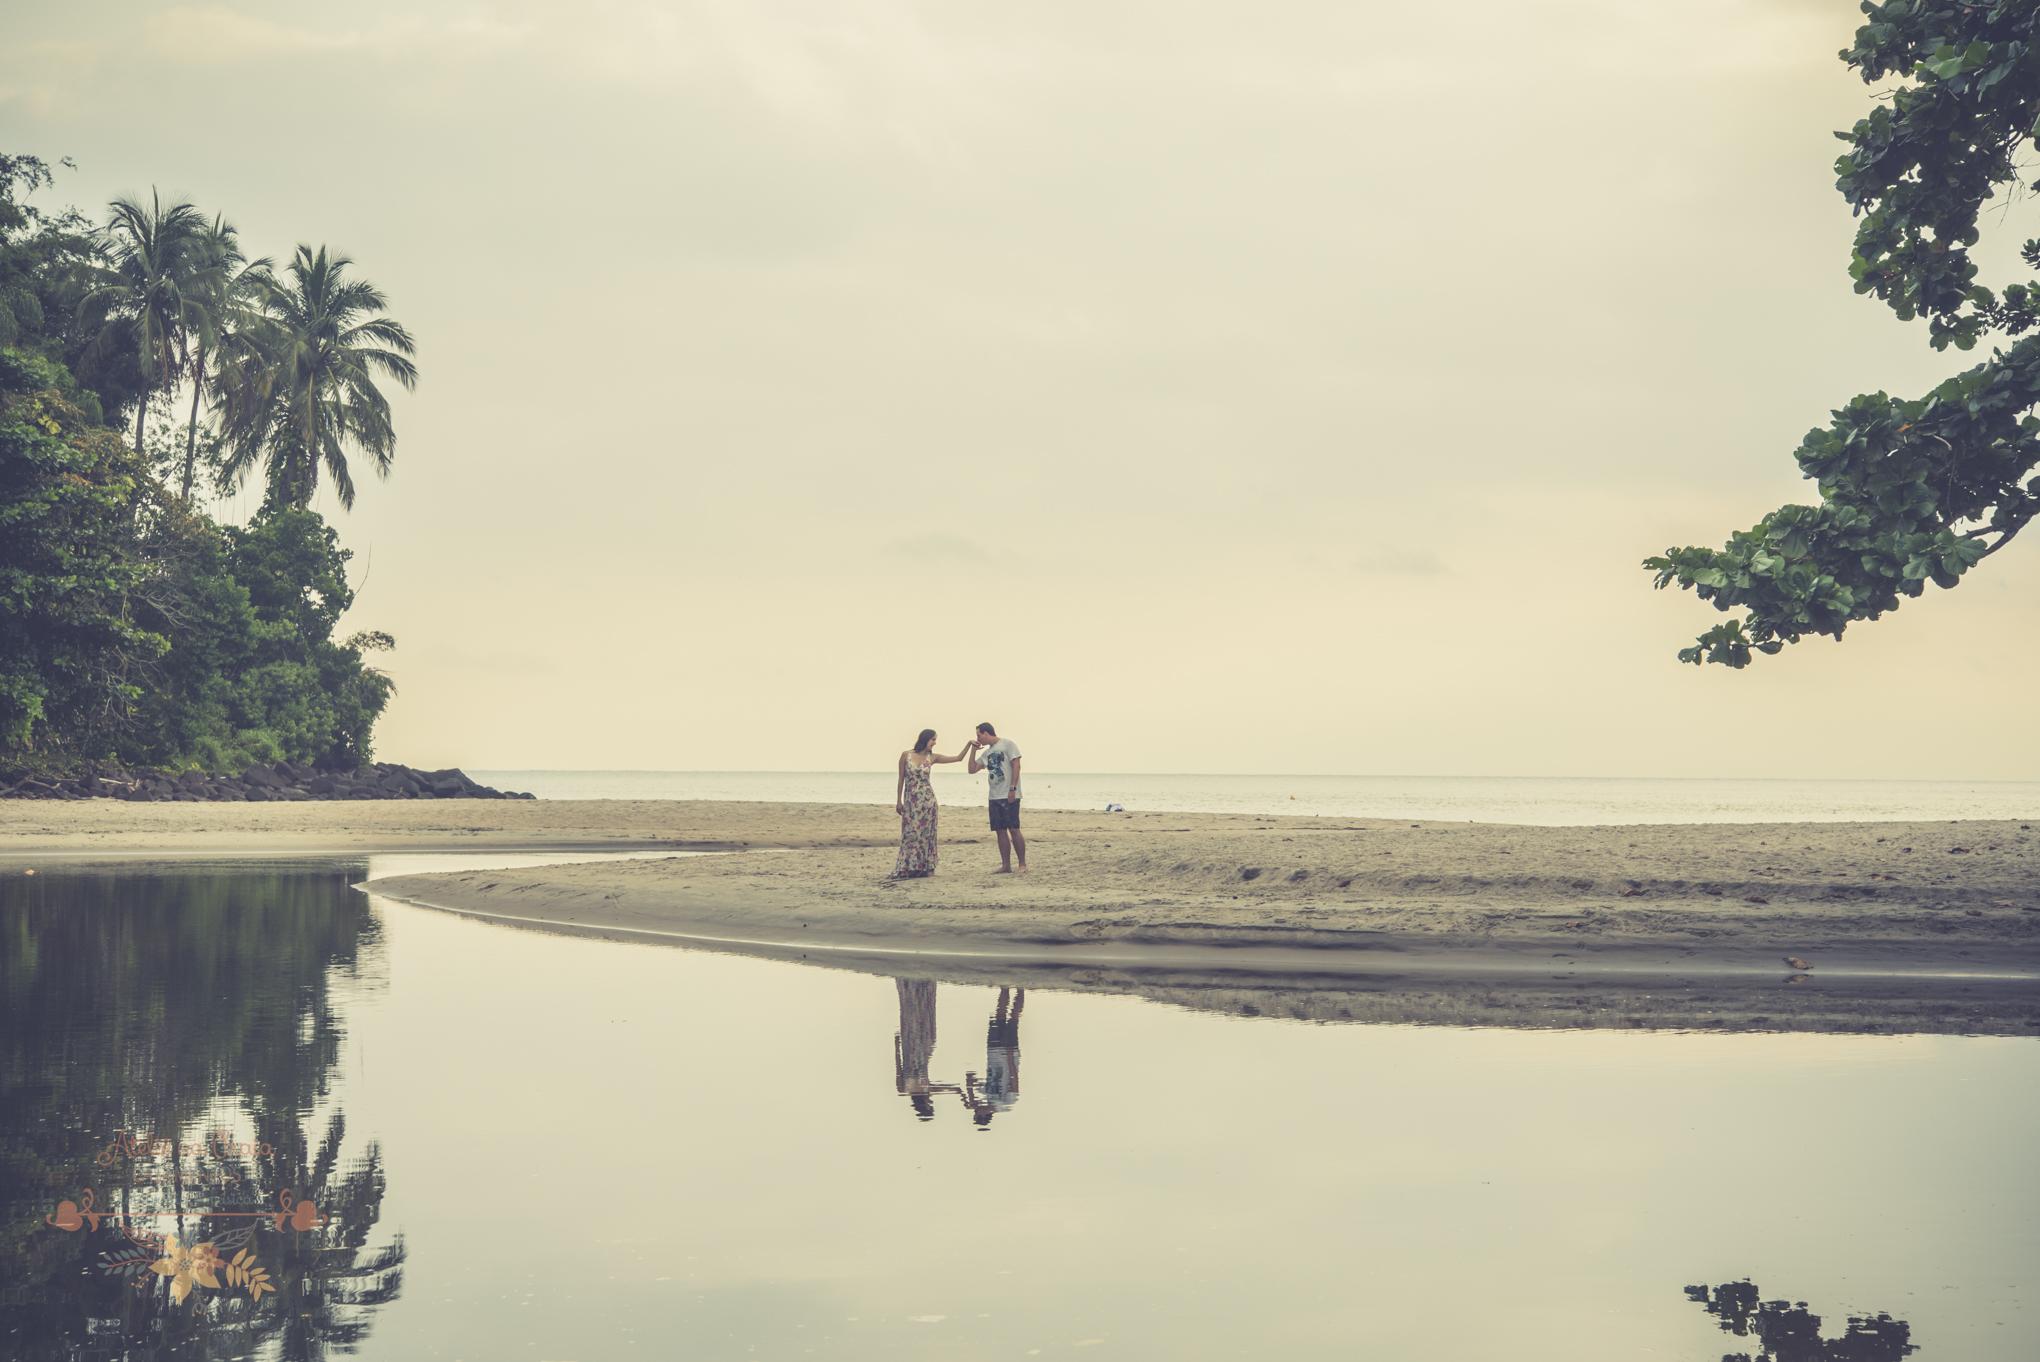 Atelie-na-Praia-Pre-Wedding-Thiesa-Bruno-PQ-2460